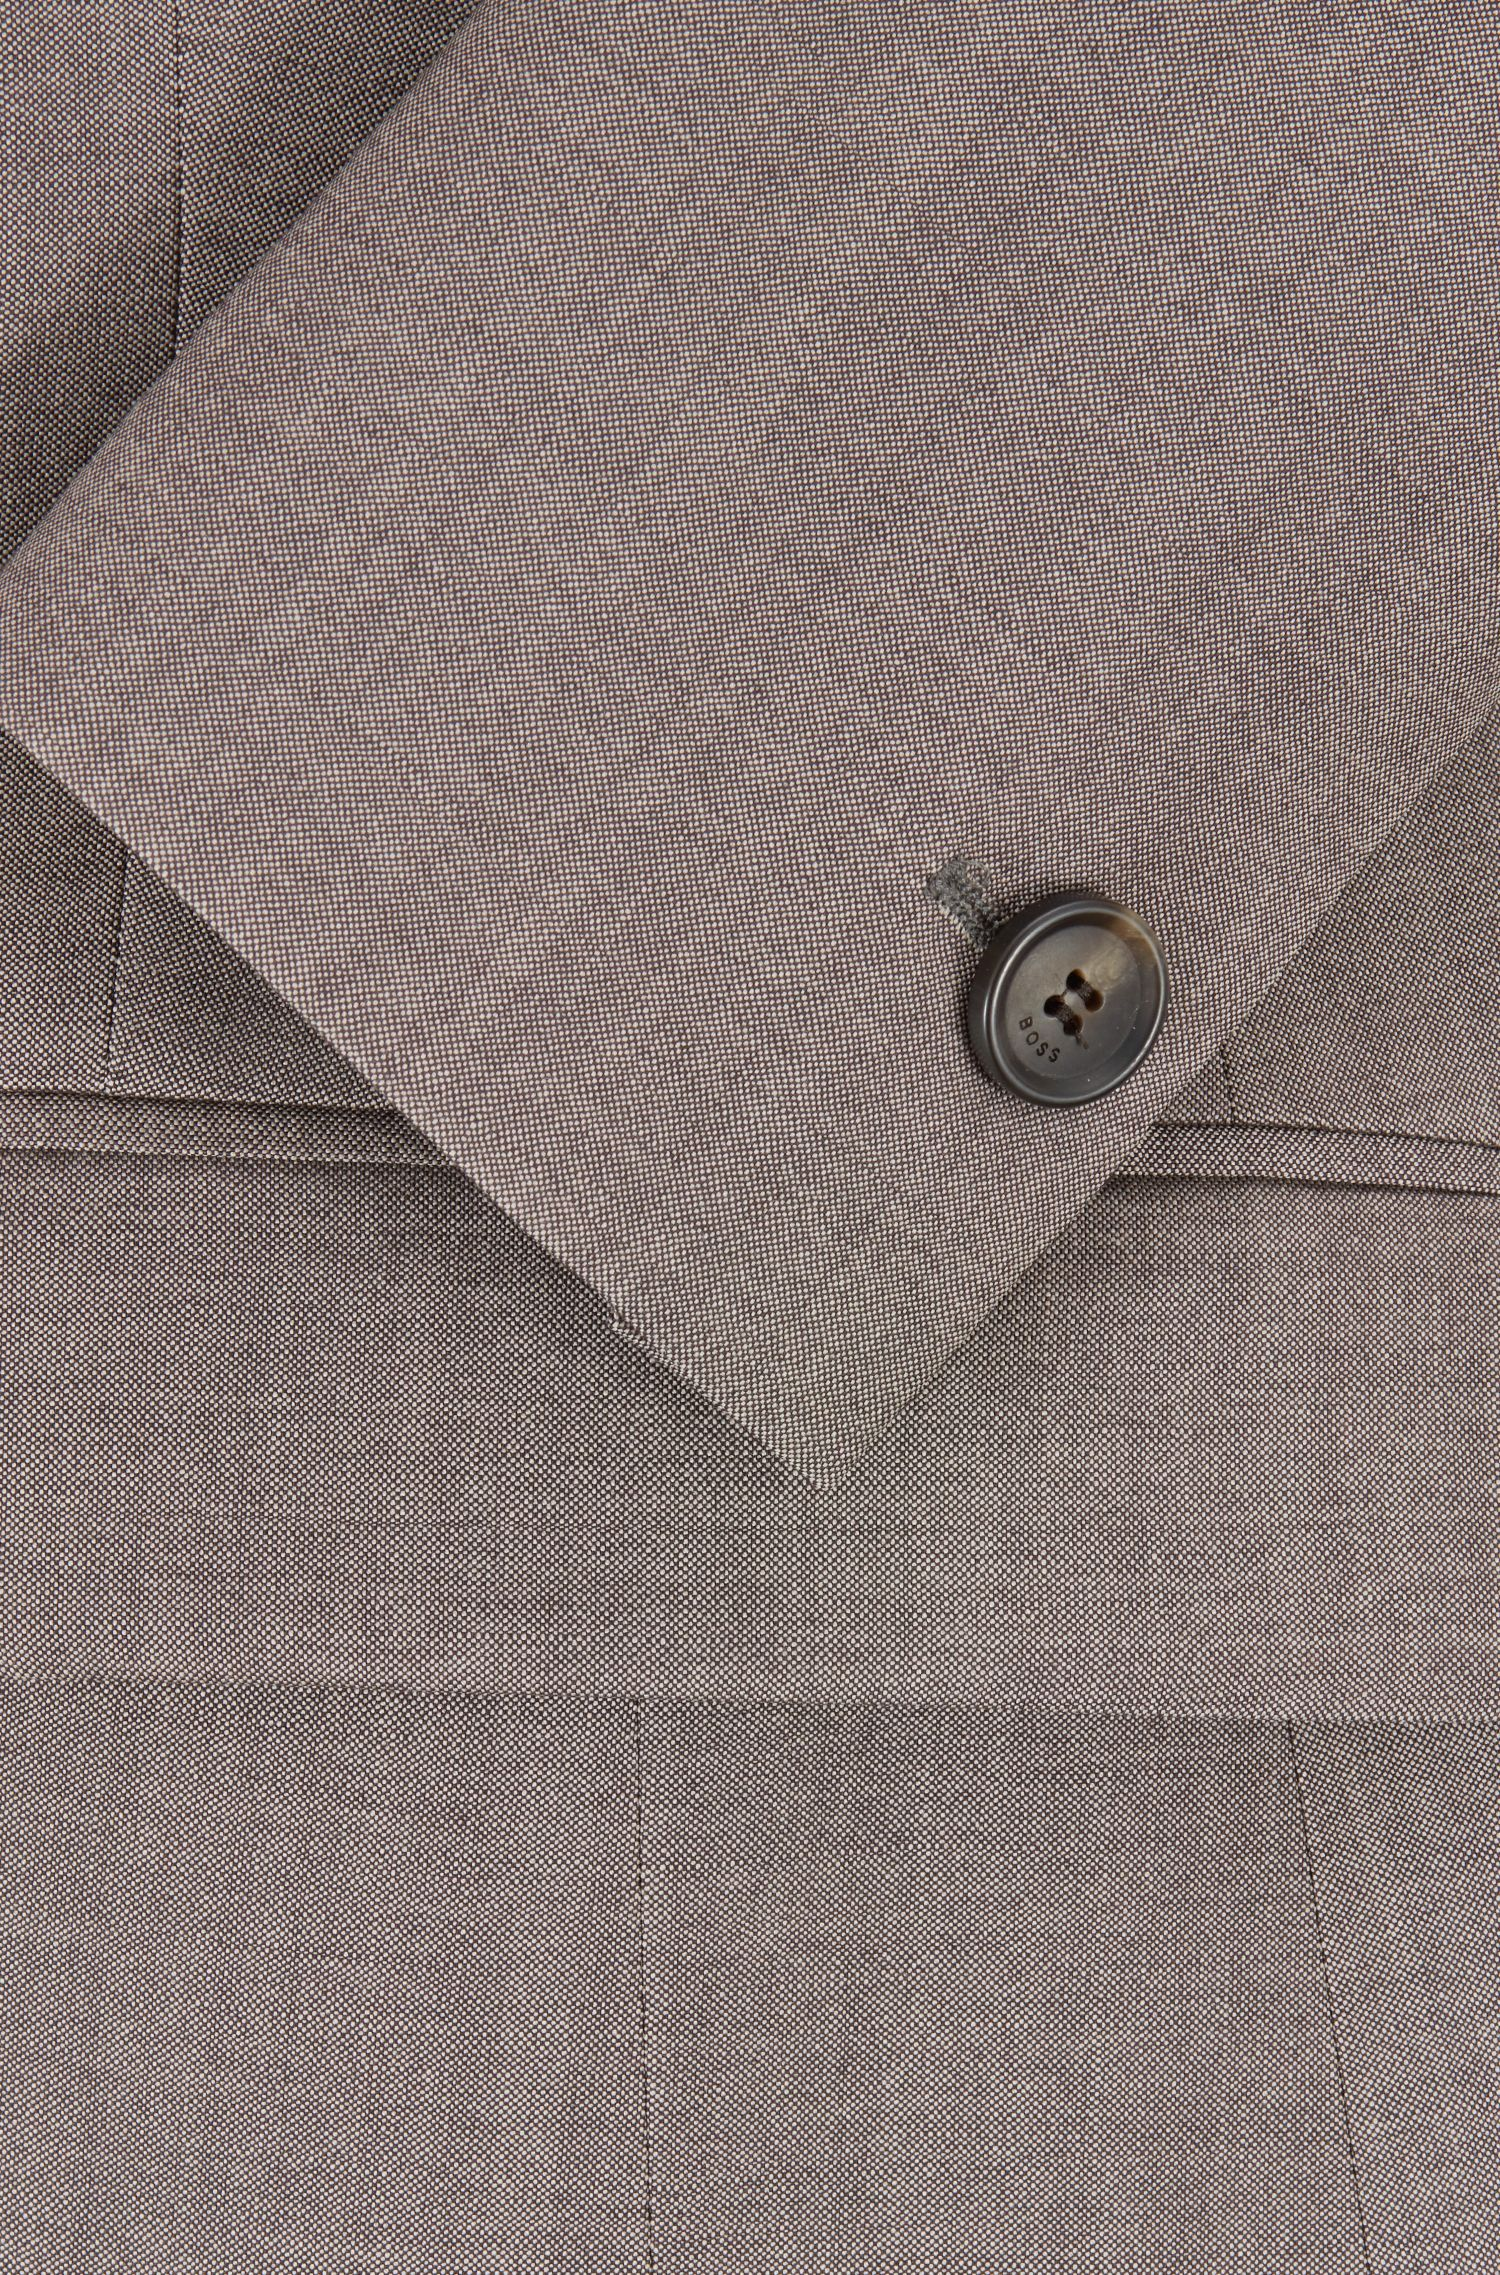 Regular-fit jacket in virgin wool with sharkskin texture, Dark Grey